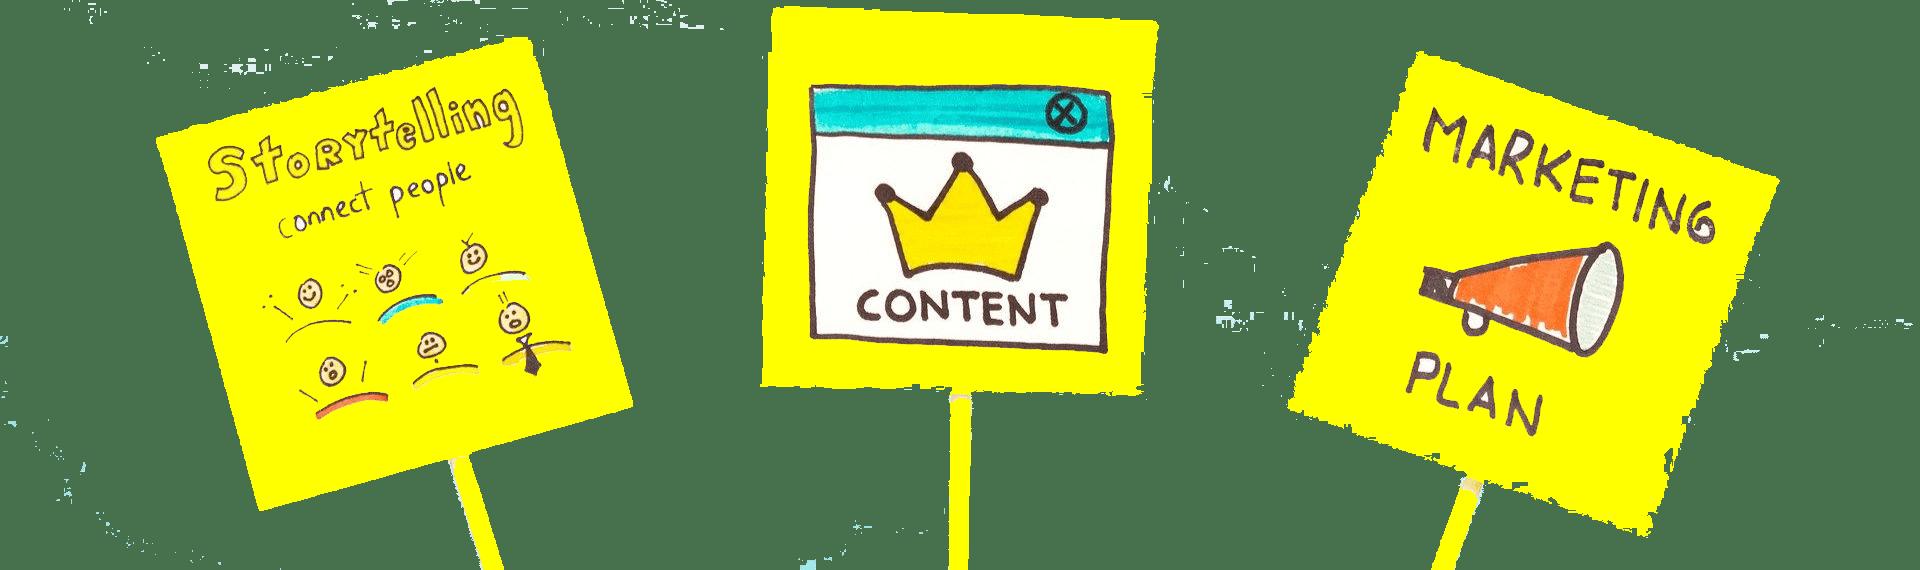 https://technobullz.com/wp-content/uploads/2018/06/digital.png